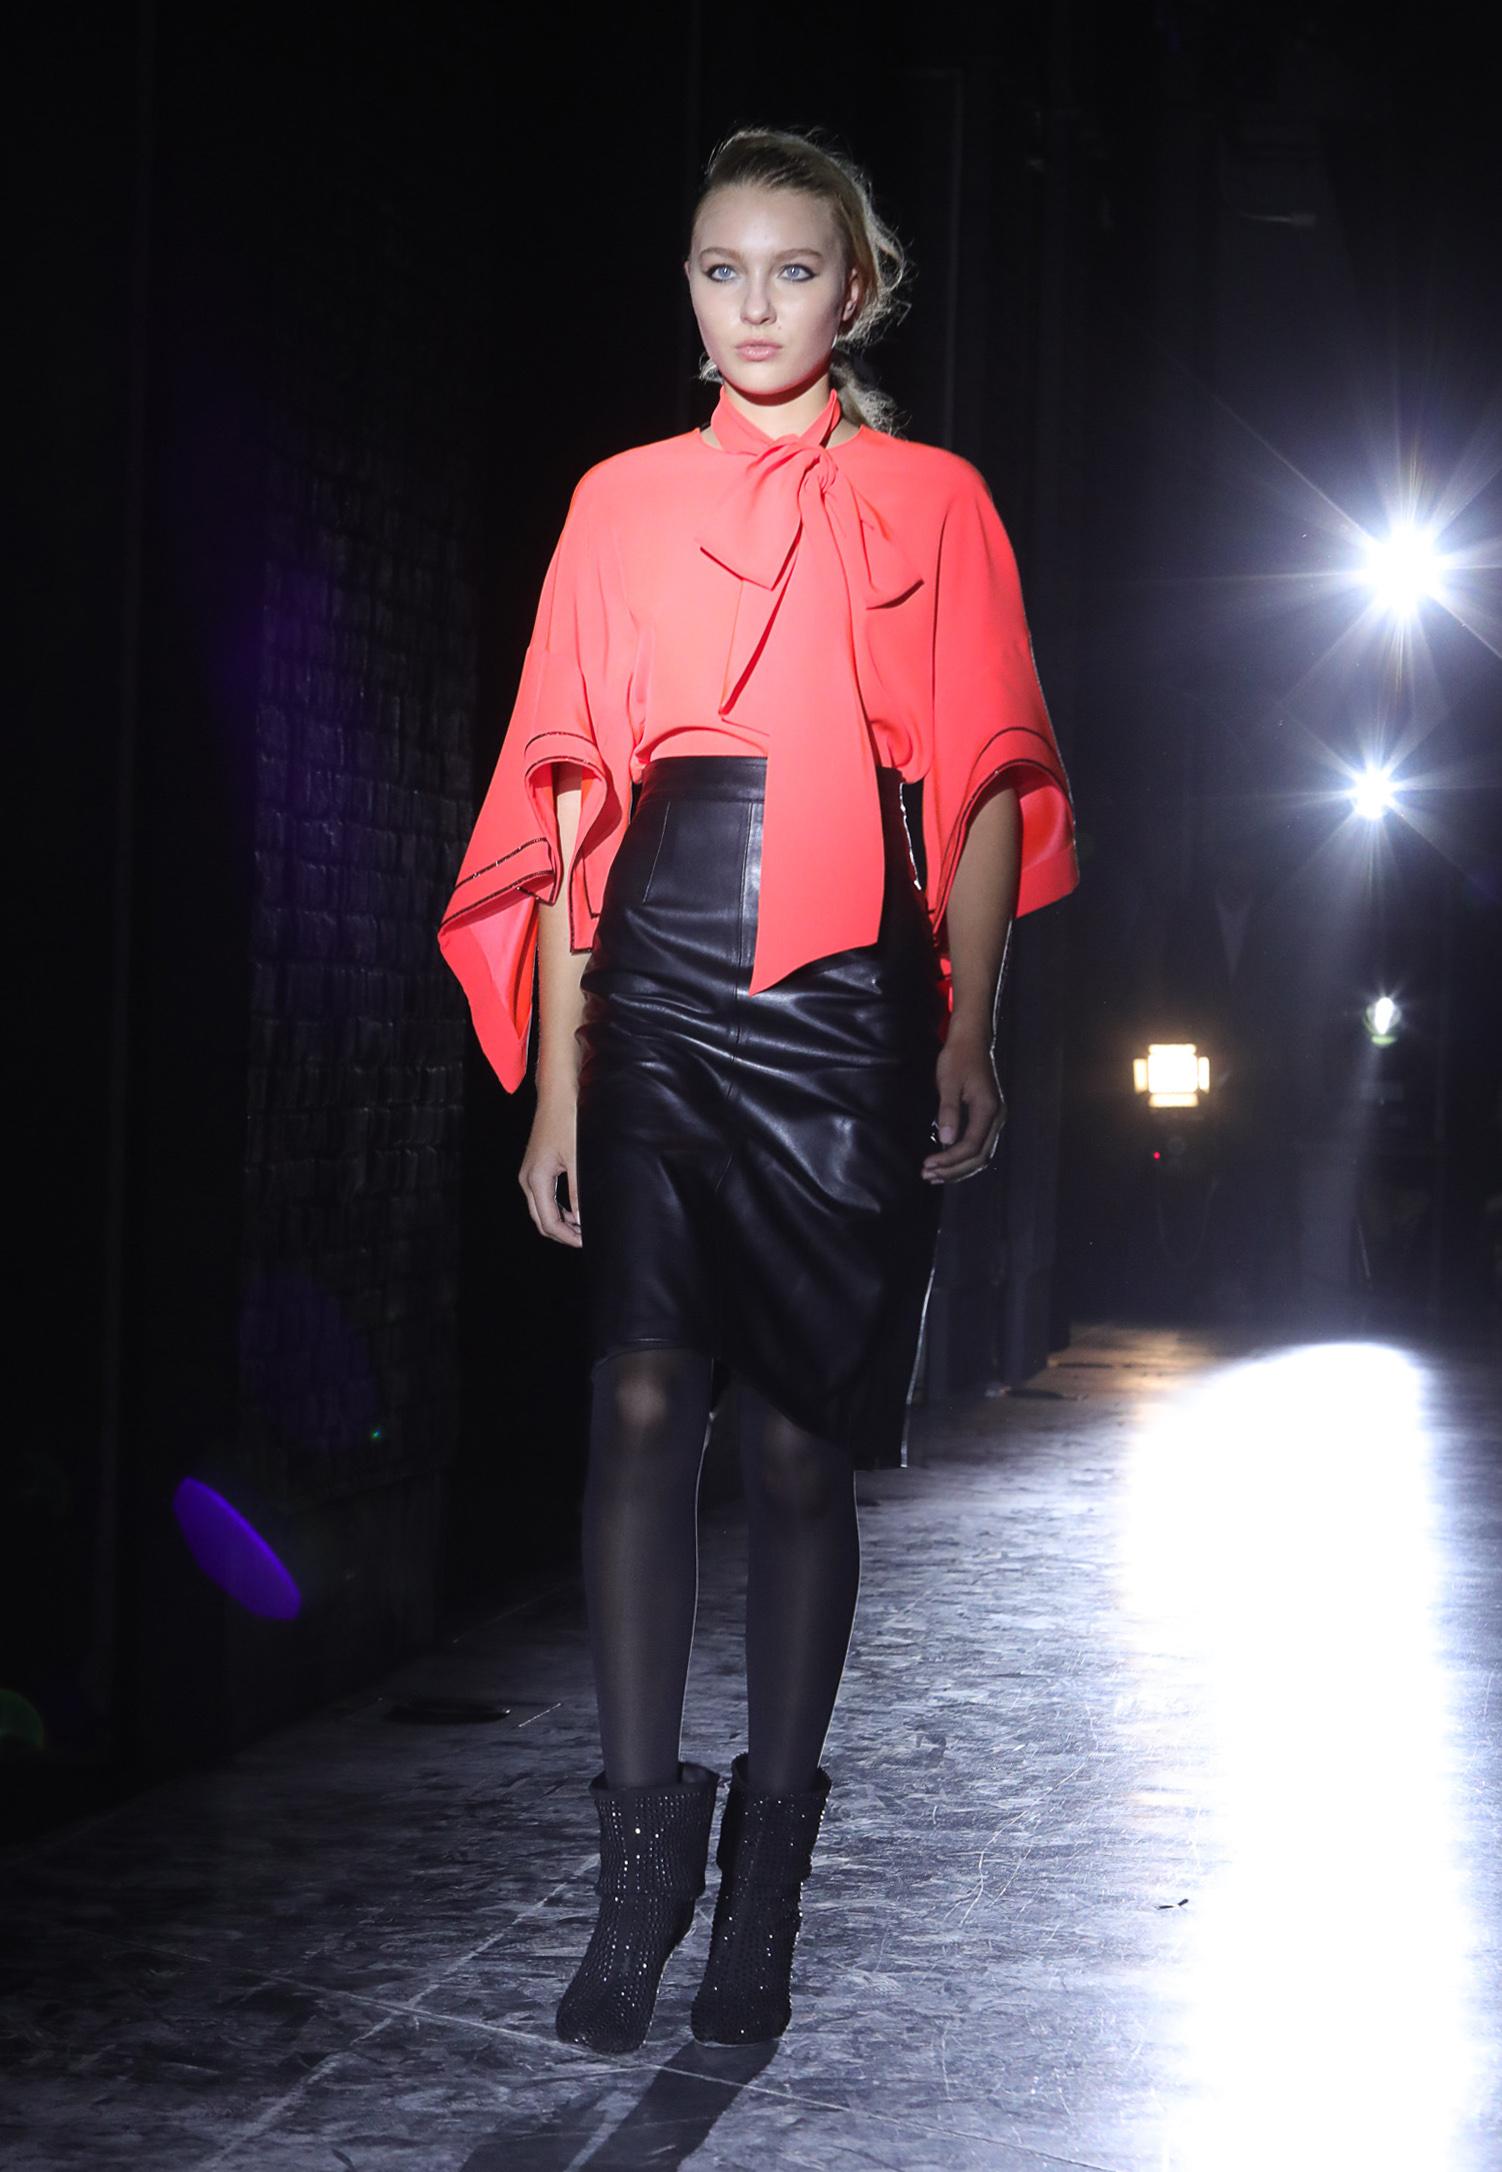 Blusas con volumen combinadas con faldas tubosGénero fluidos dan vida a túnicas